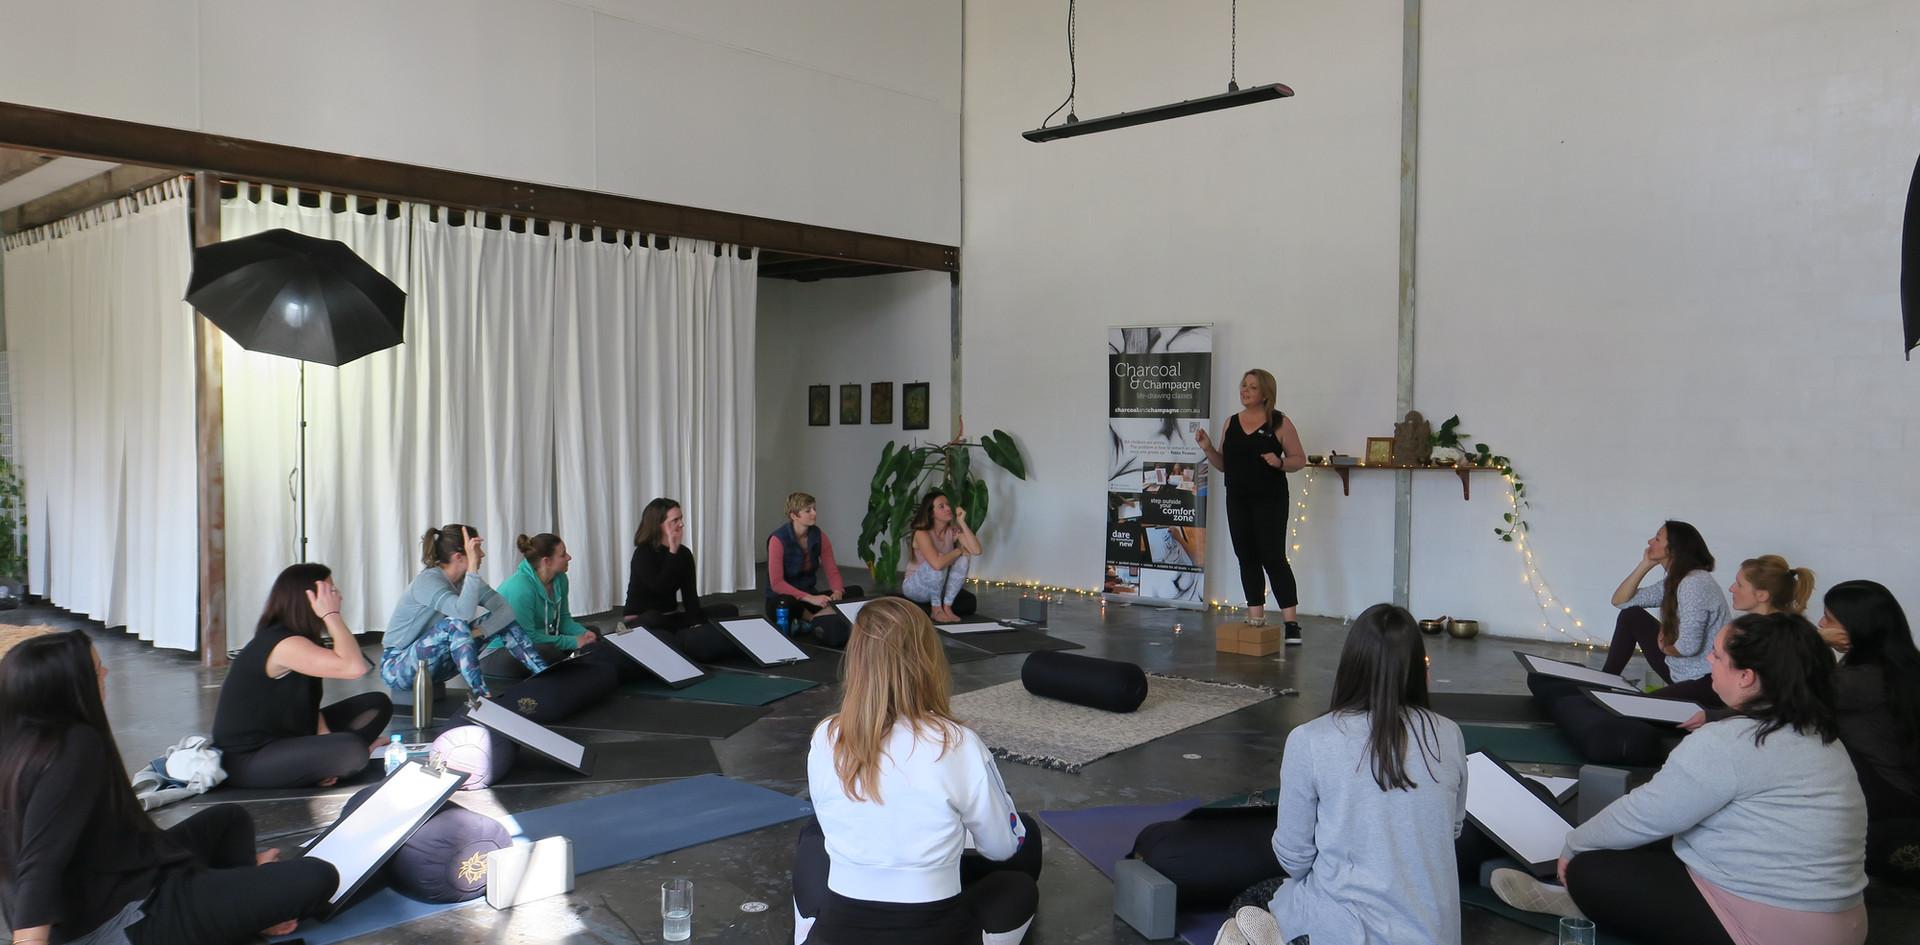 Creativity coach Aneta Wnek guiding each step of the workshop ...